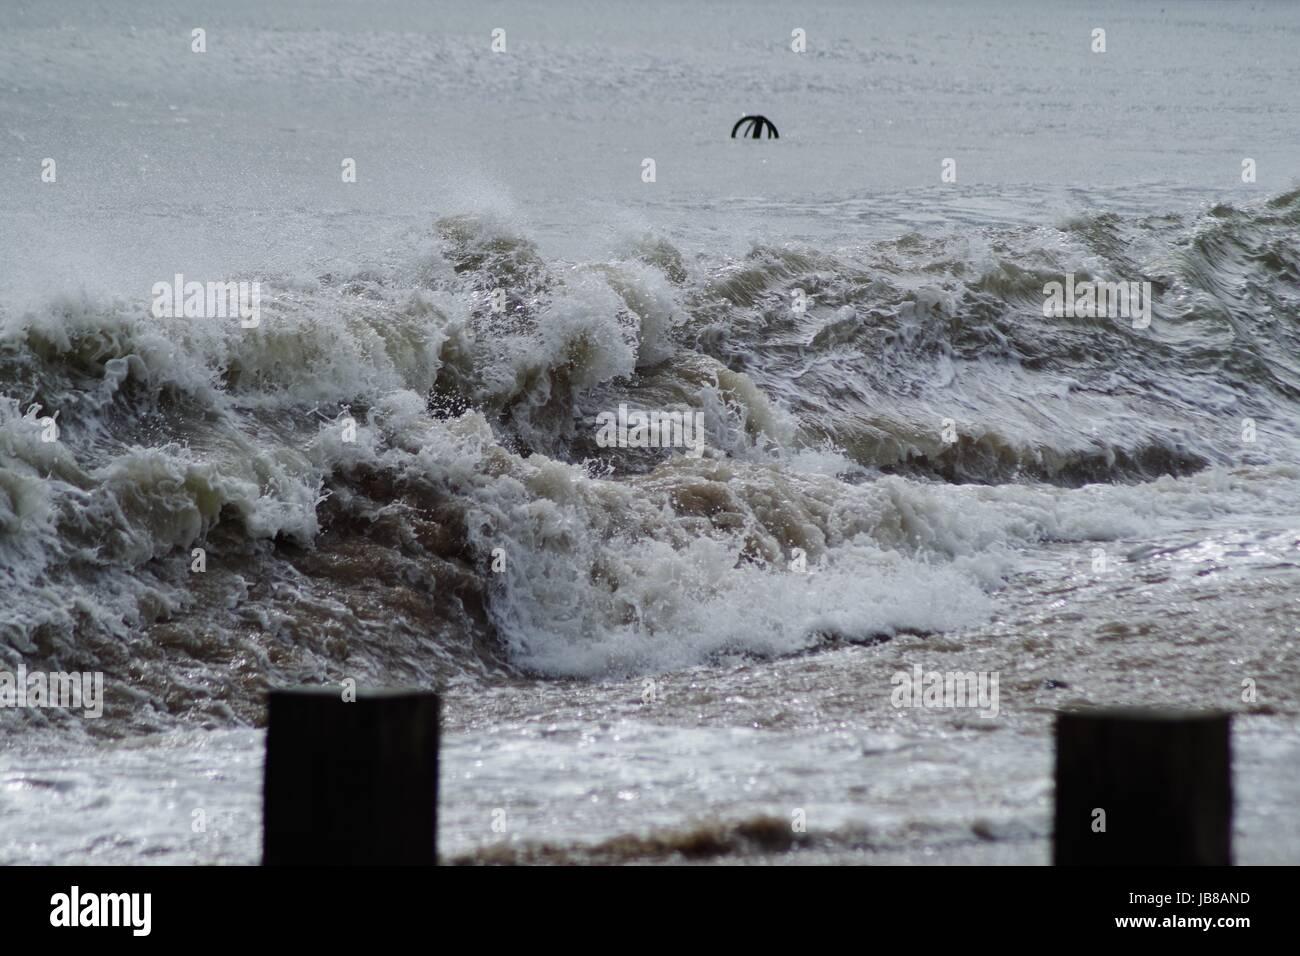 Textured Beach Breaking North Sea Wave on Aberdeen's Beach, April 2017. Scotland. - Stock Image